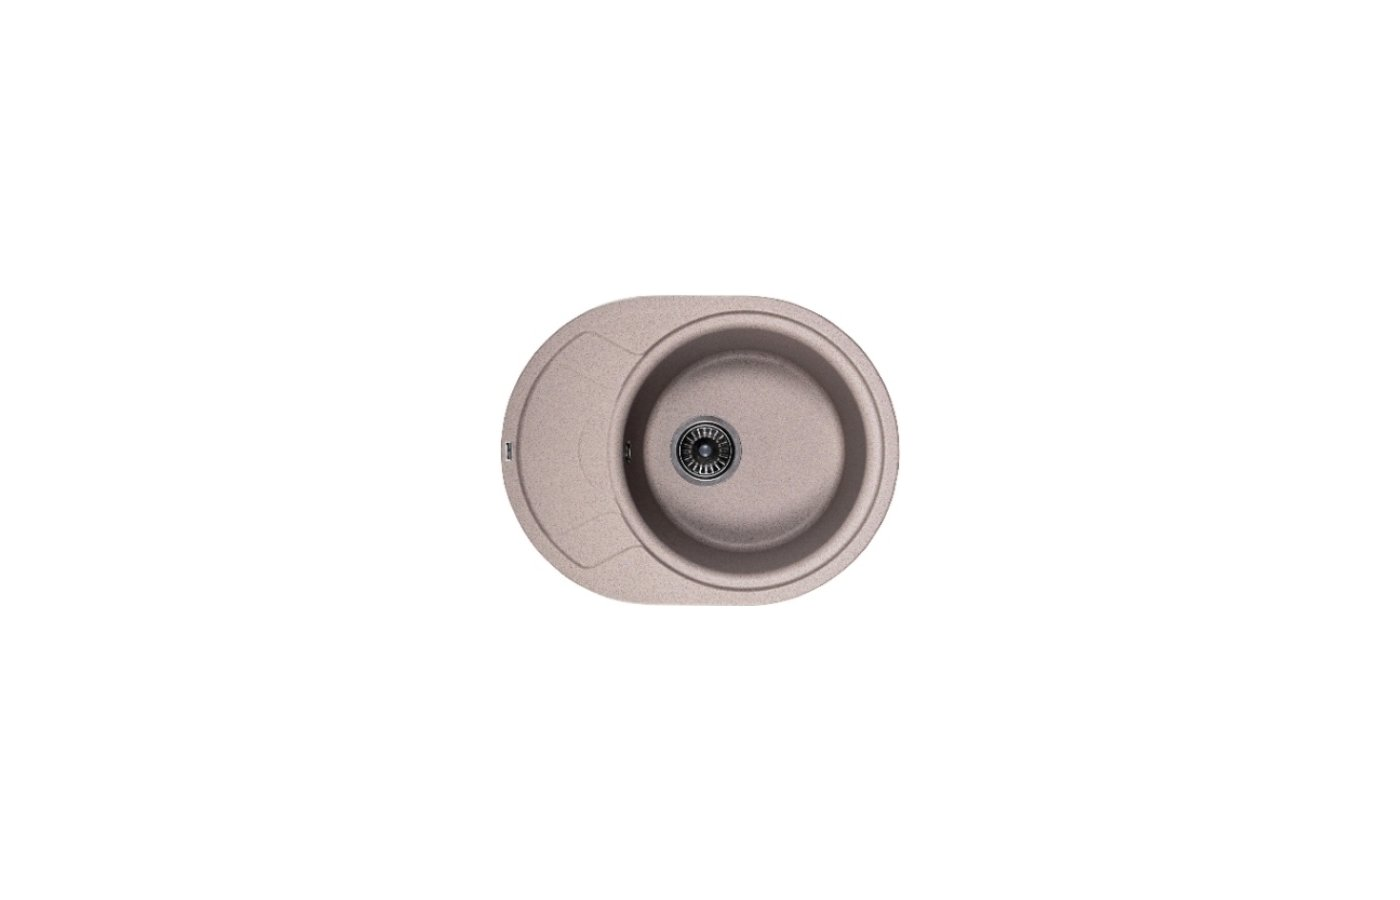 Кухонная мойка Weissgauff ASCOT 575 Eco Granit серый беж